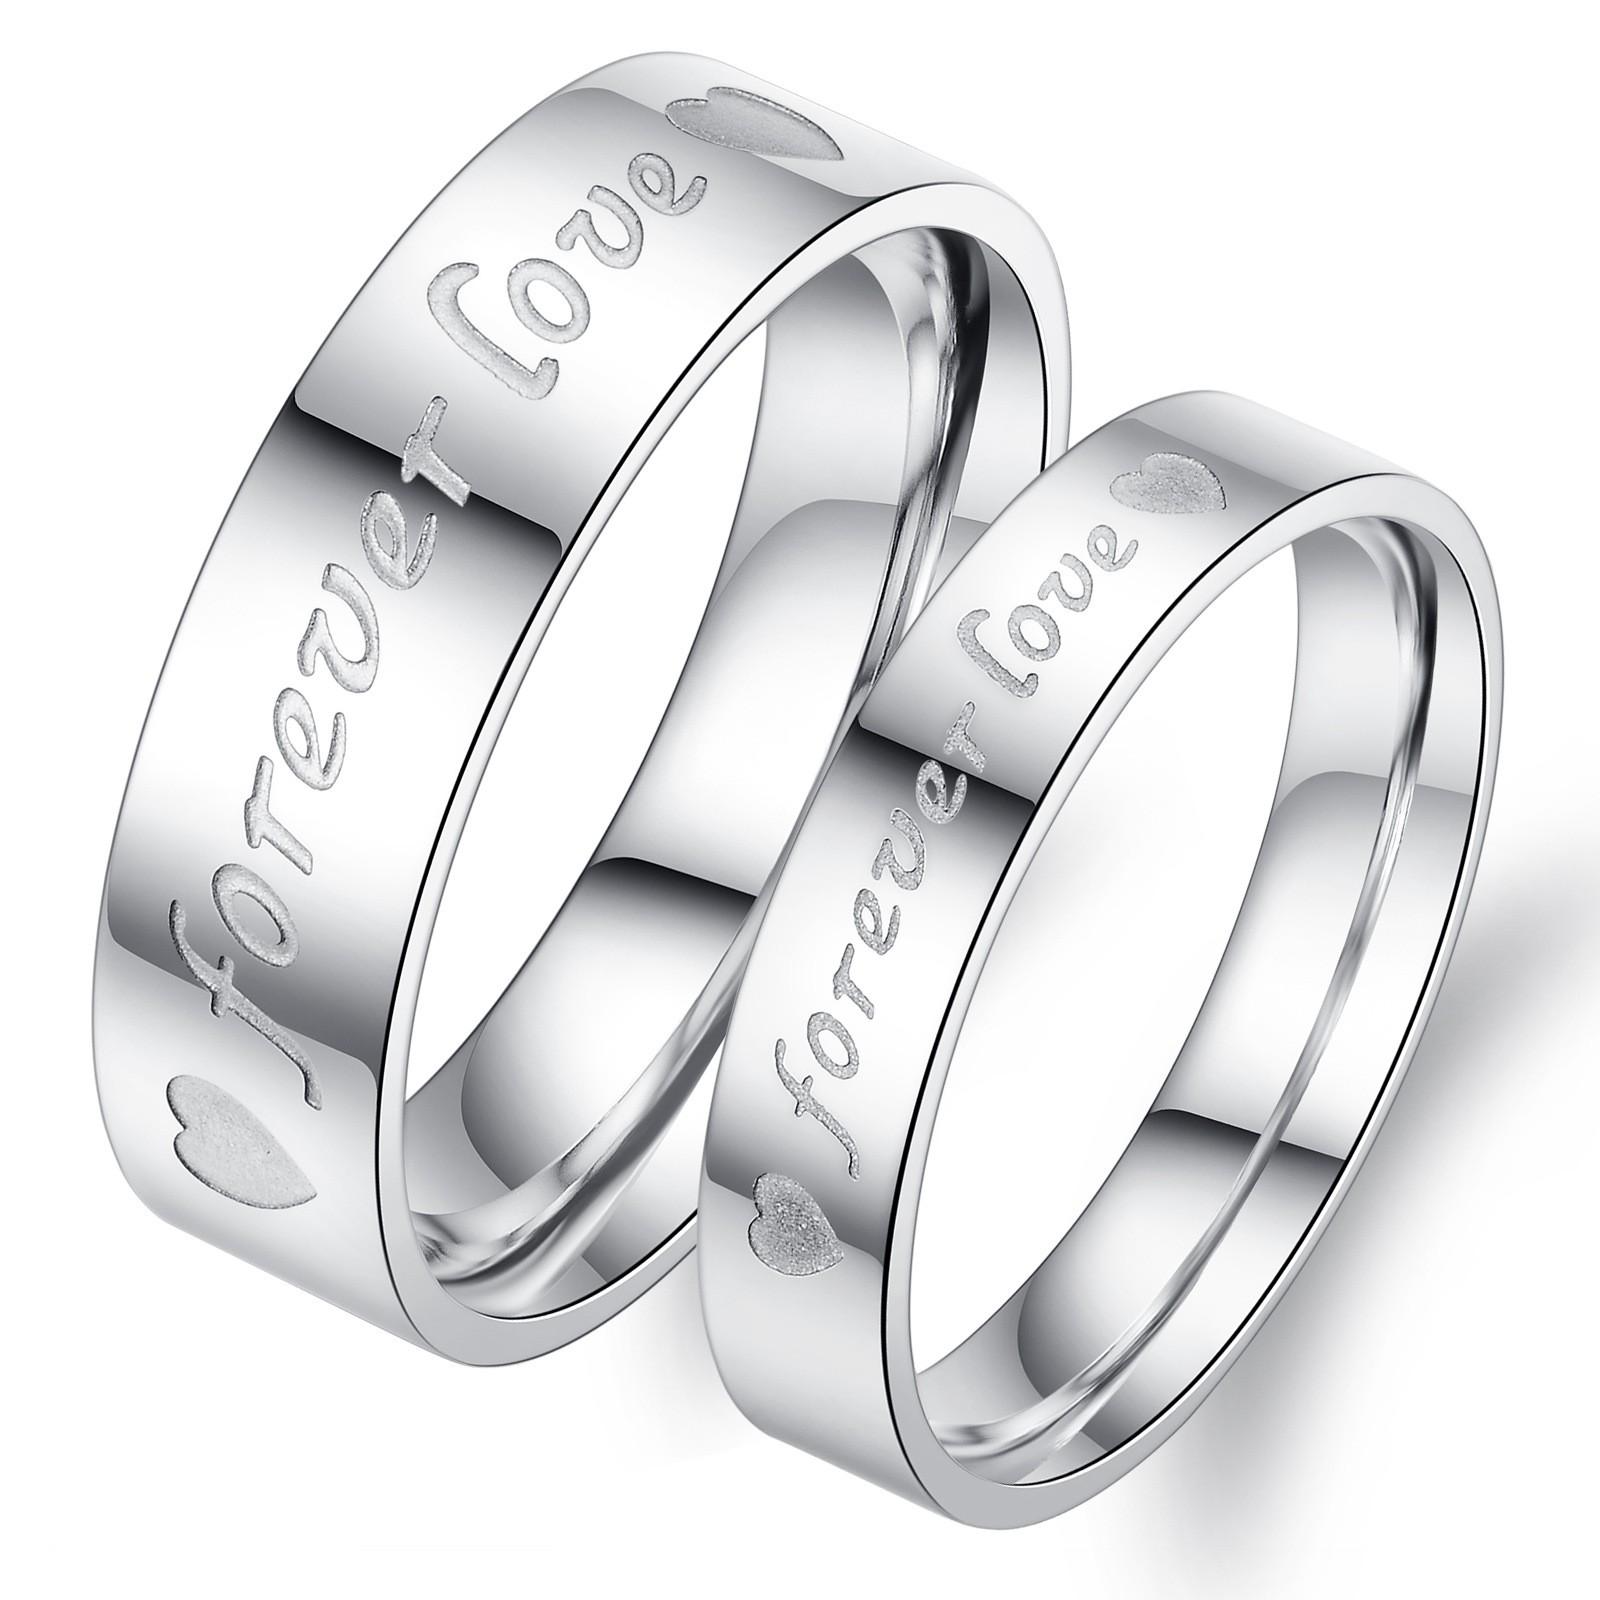 Forever Love Engravable Titanium Steel Matching Set Affordable